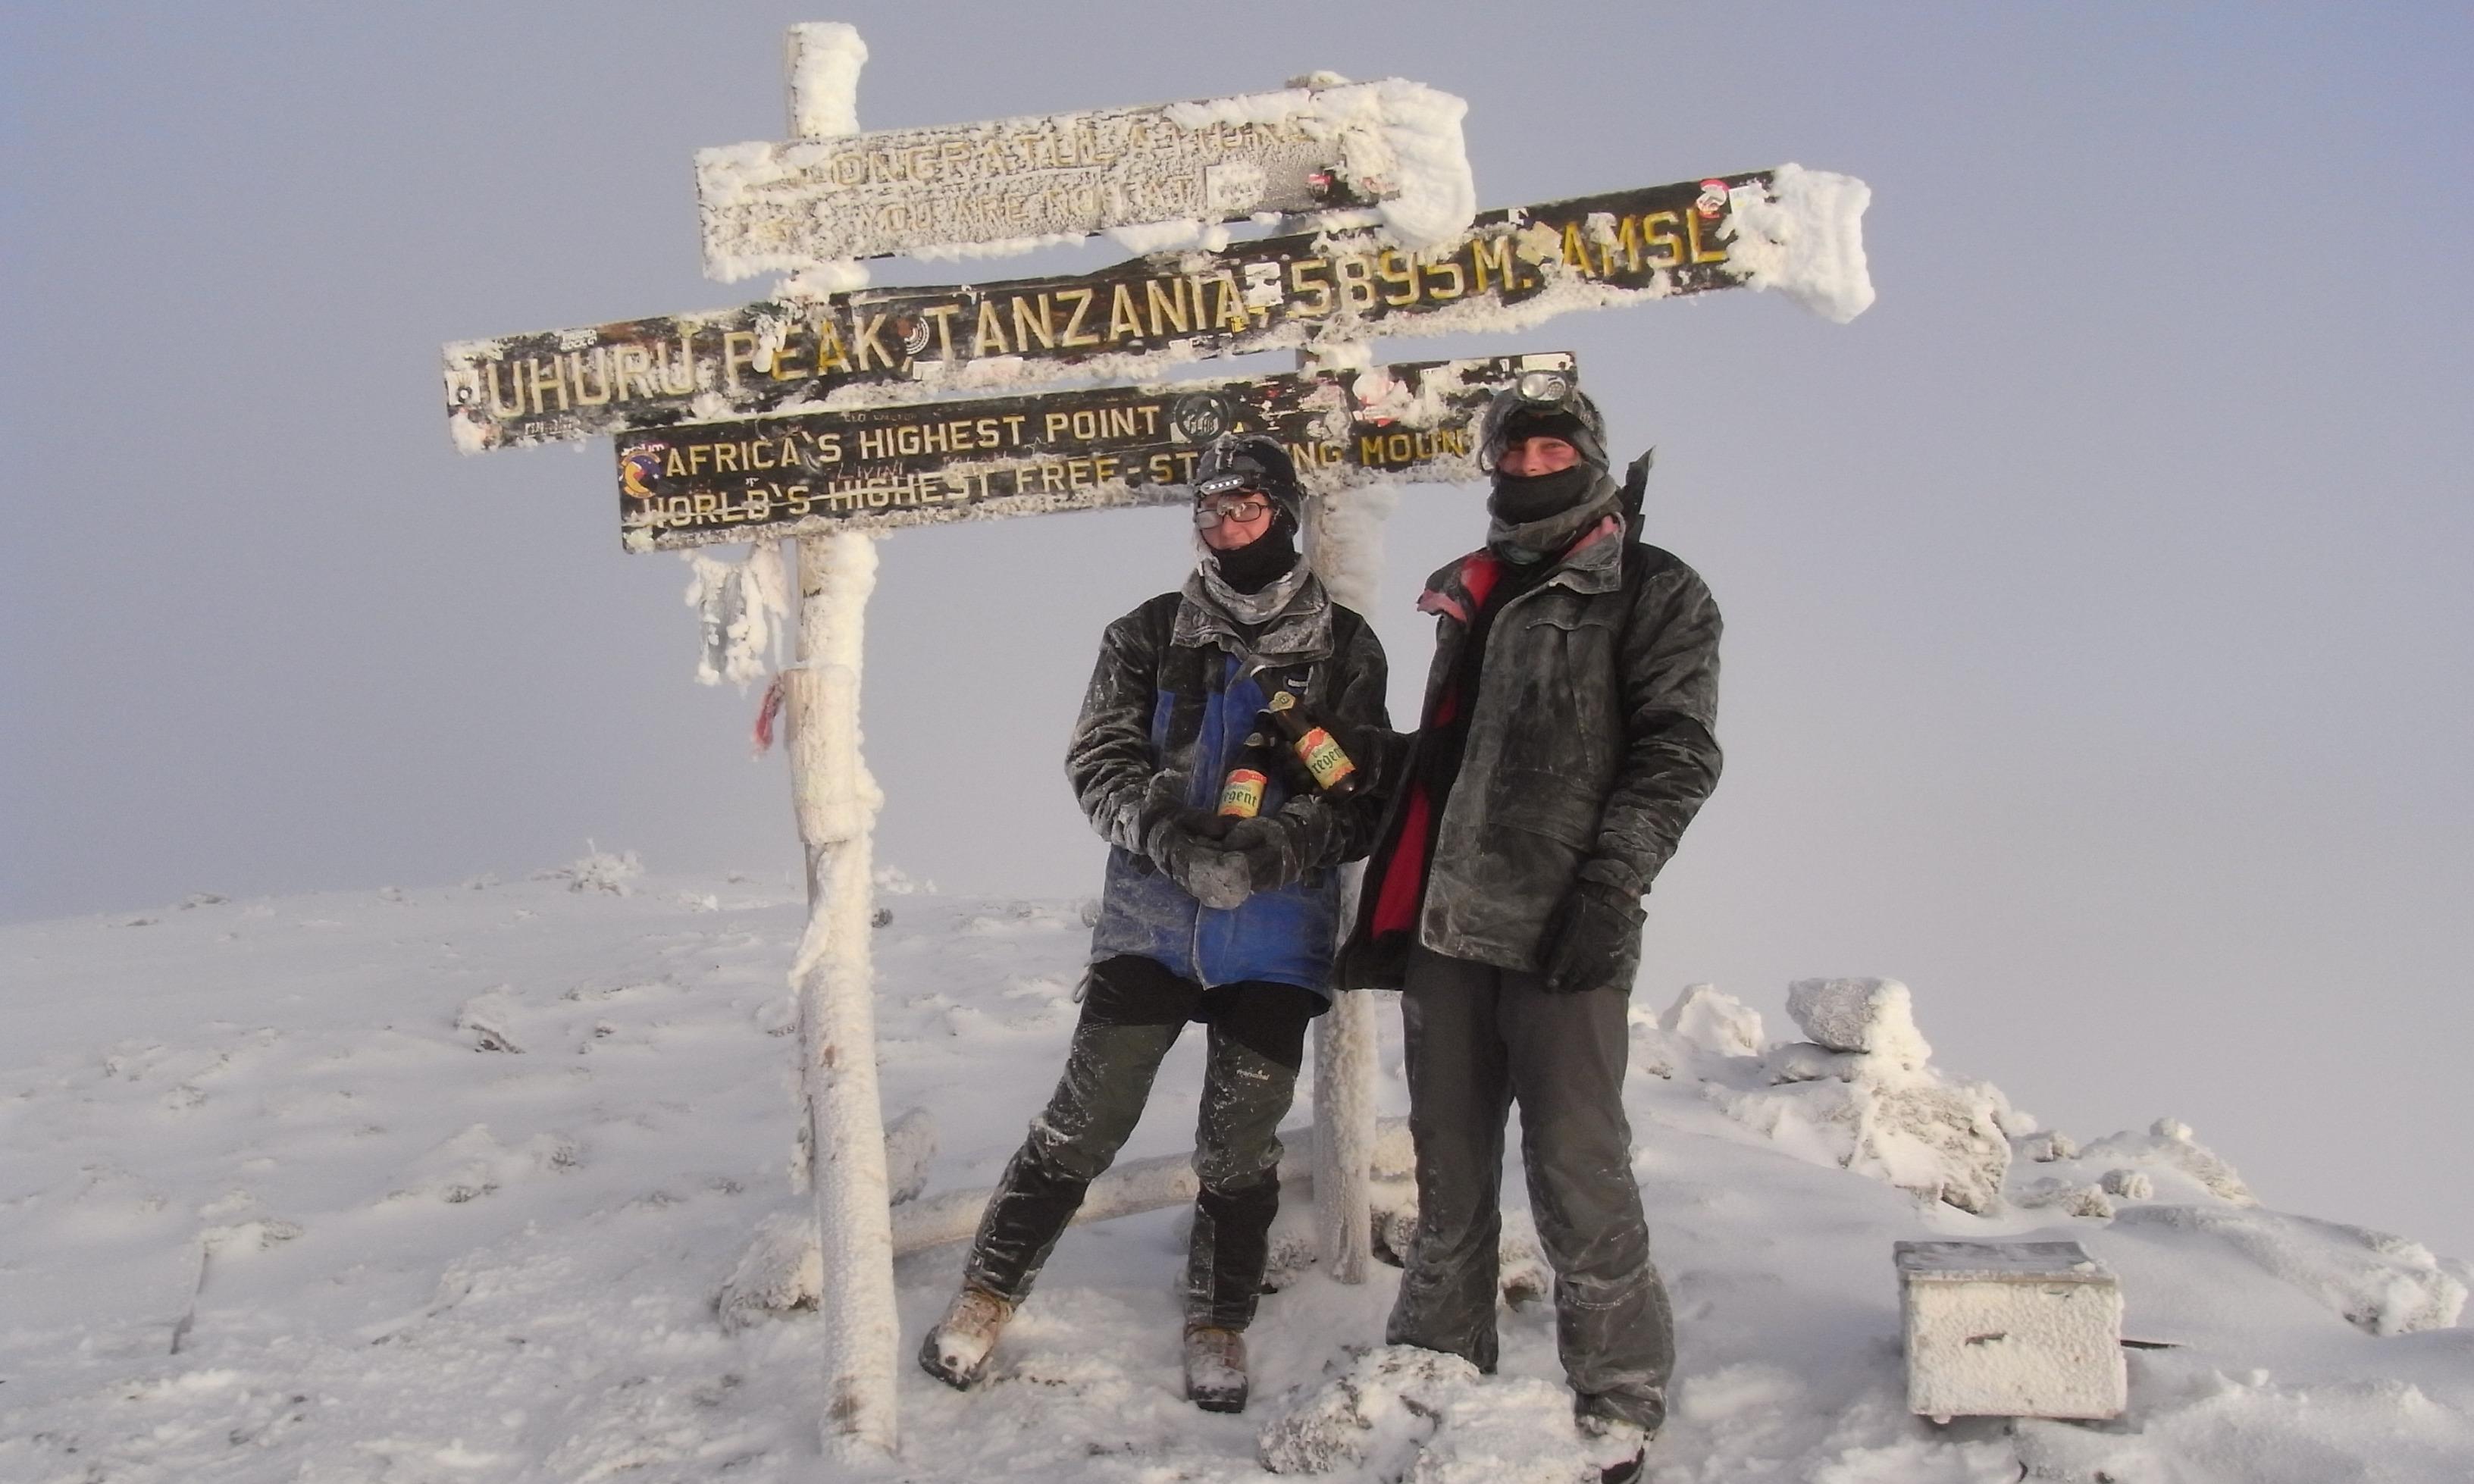 Auf den Kilimanjaro!   story.one